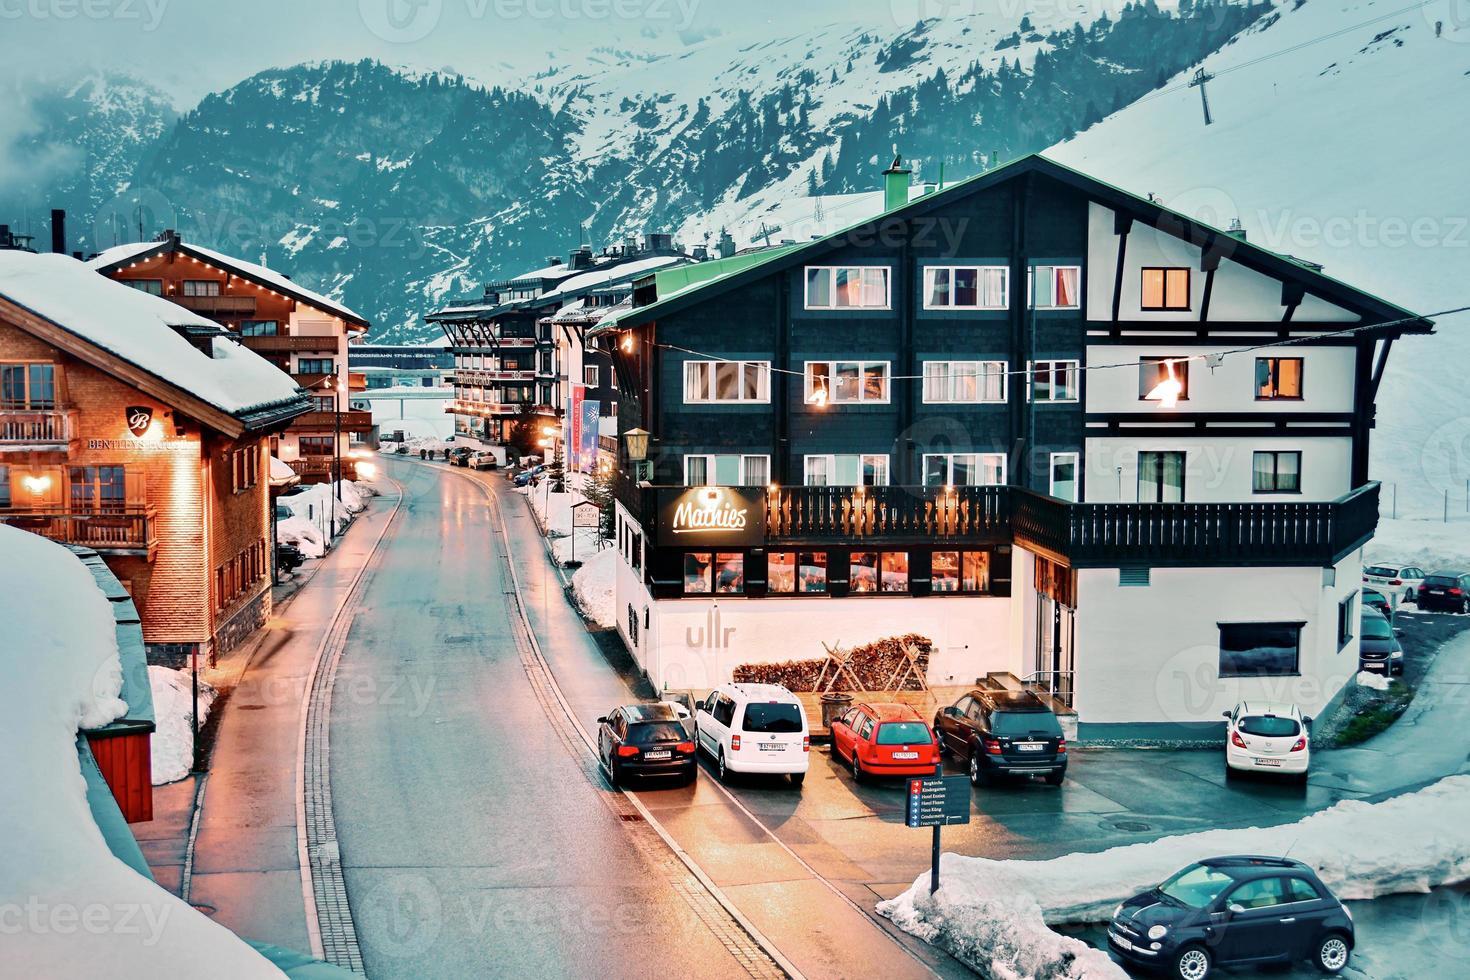 Everning in Zurs ski resort photo